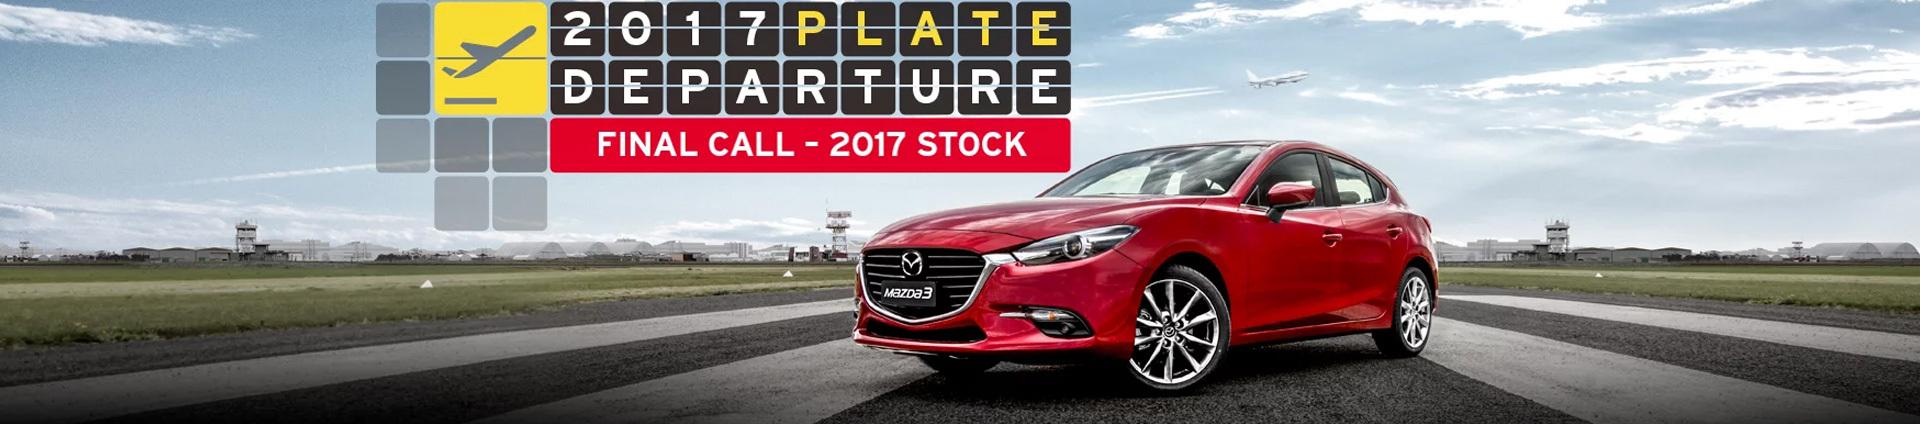 Mazda - National Offer - 2017 Plate Departure Sale